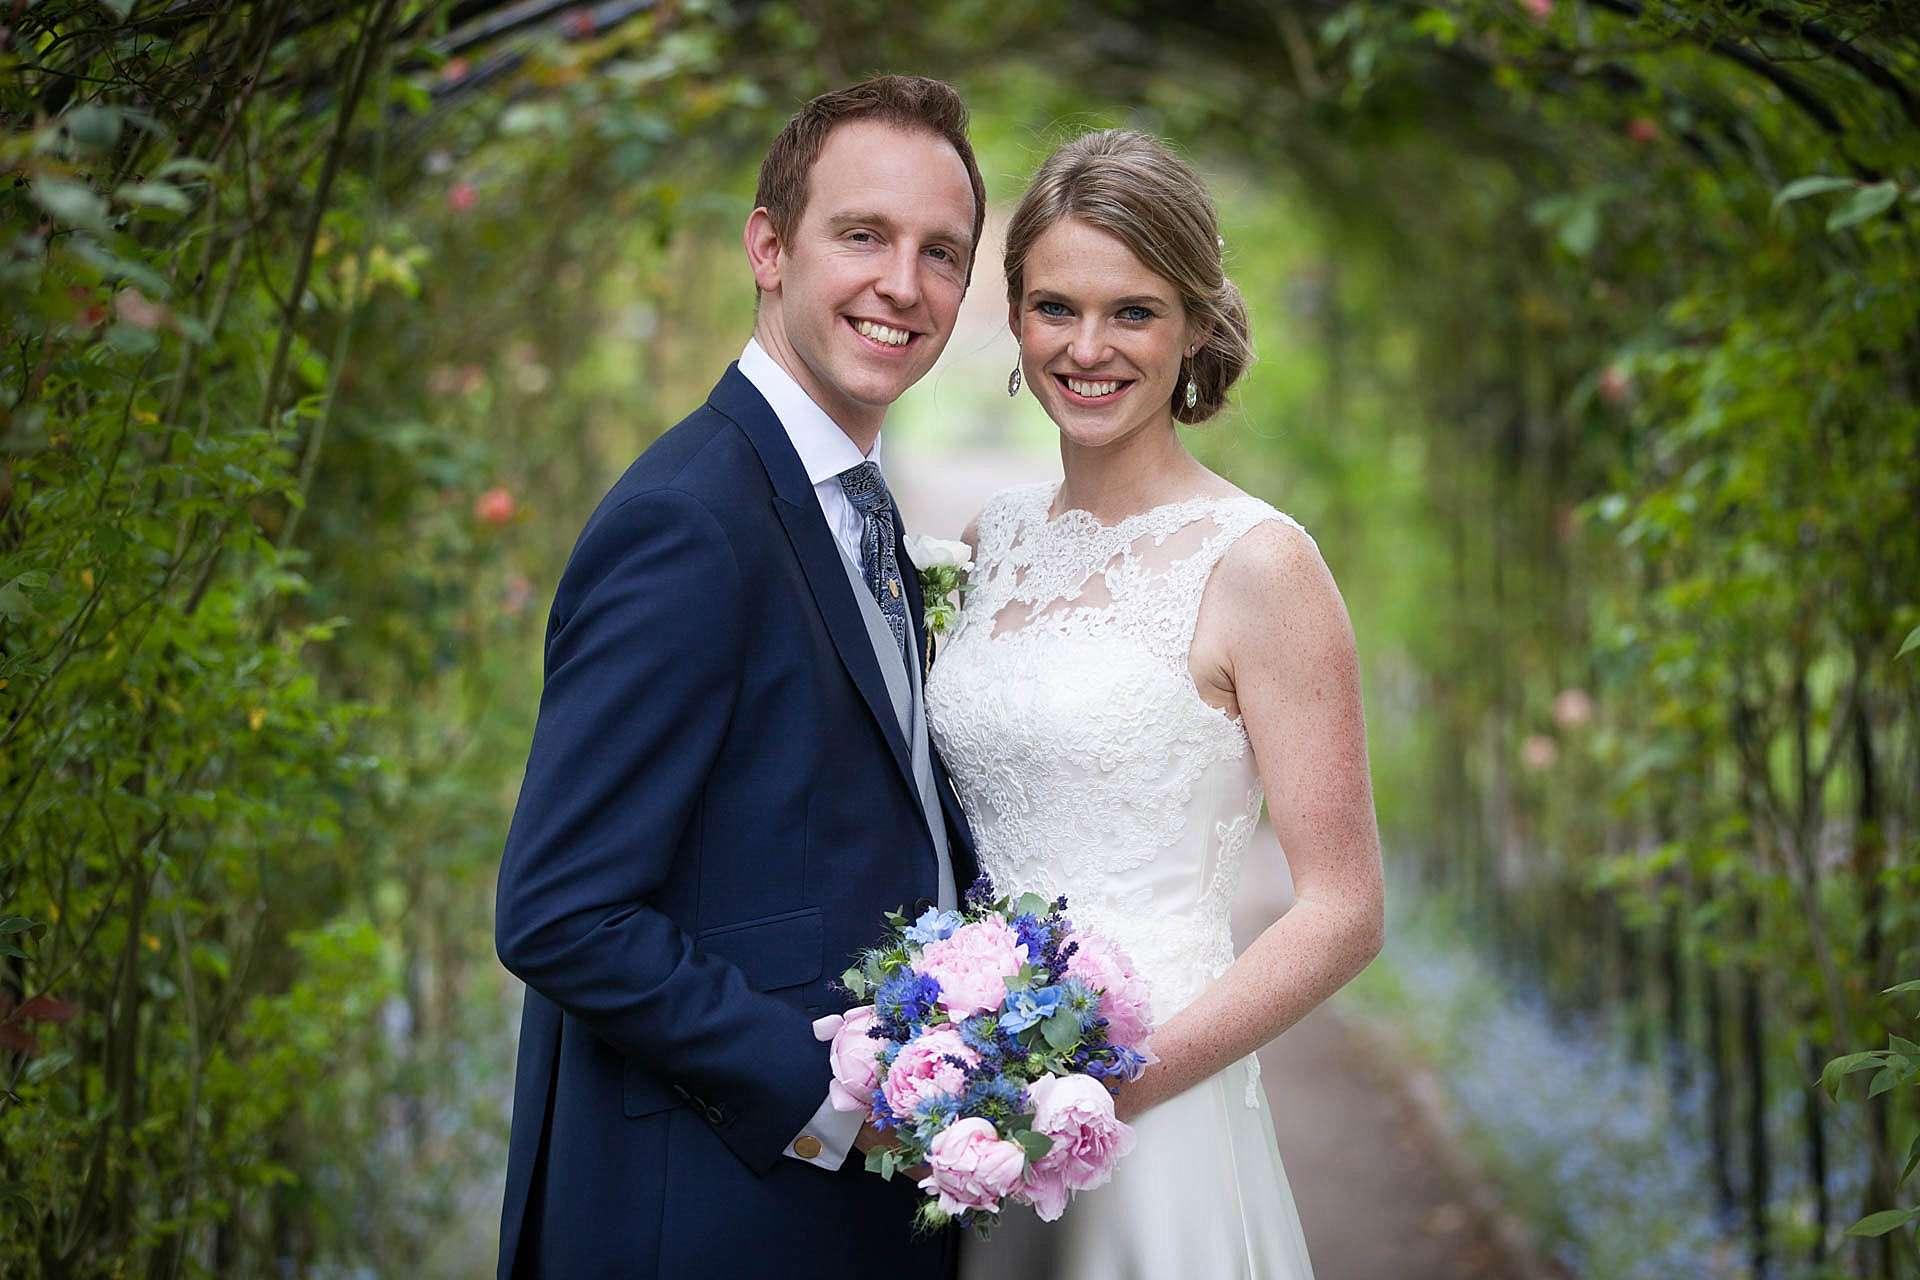 Caroline and Paul - wedding portrait